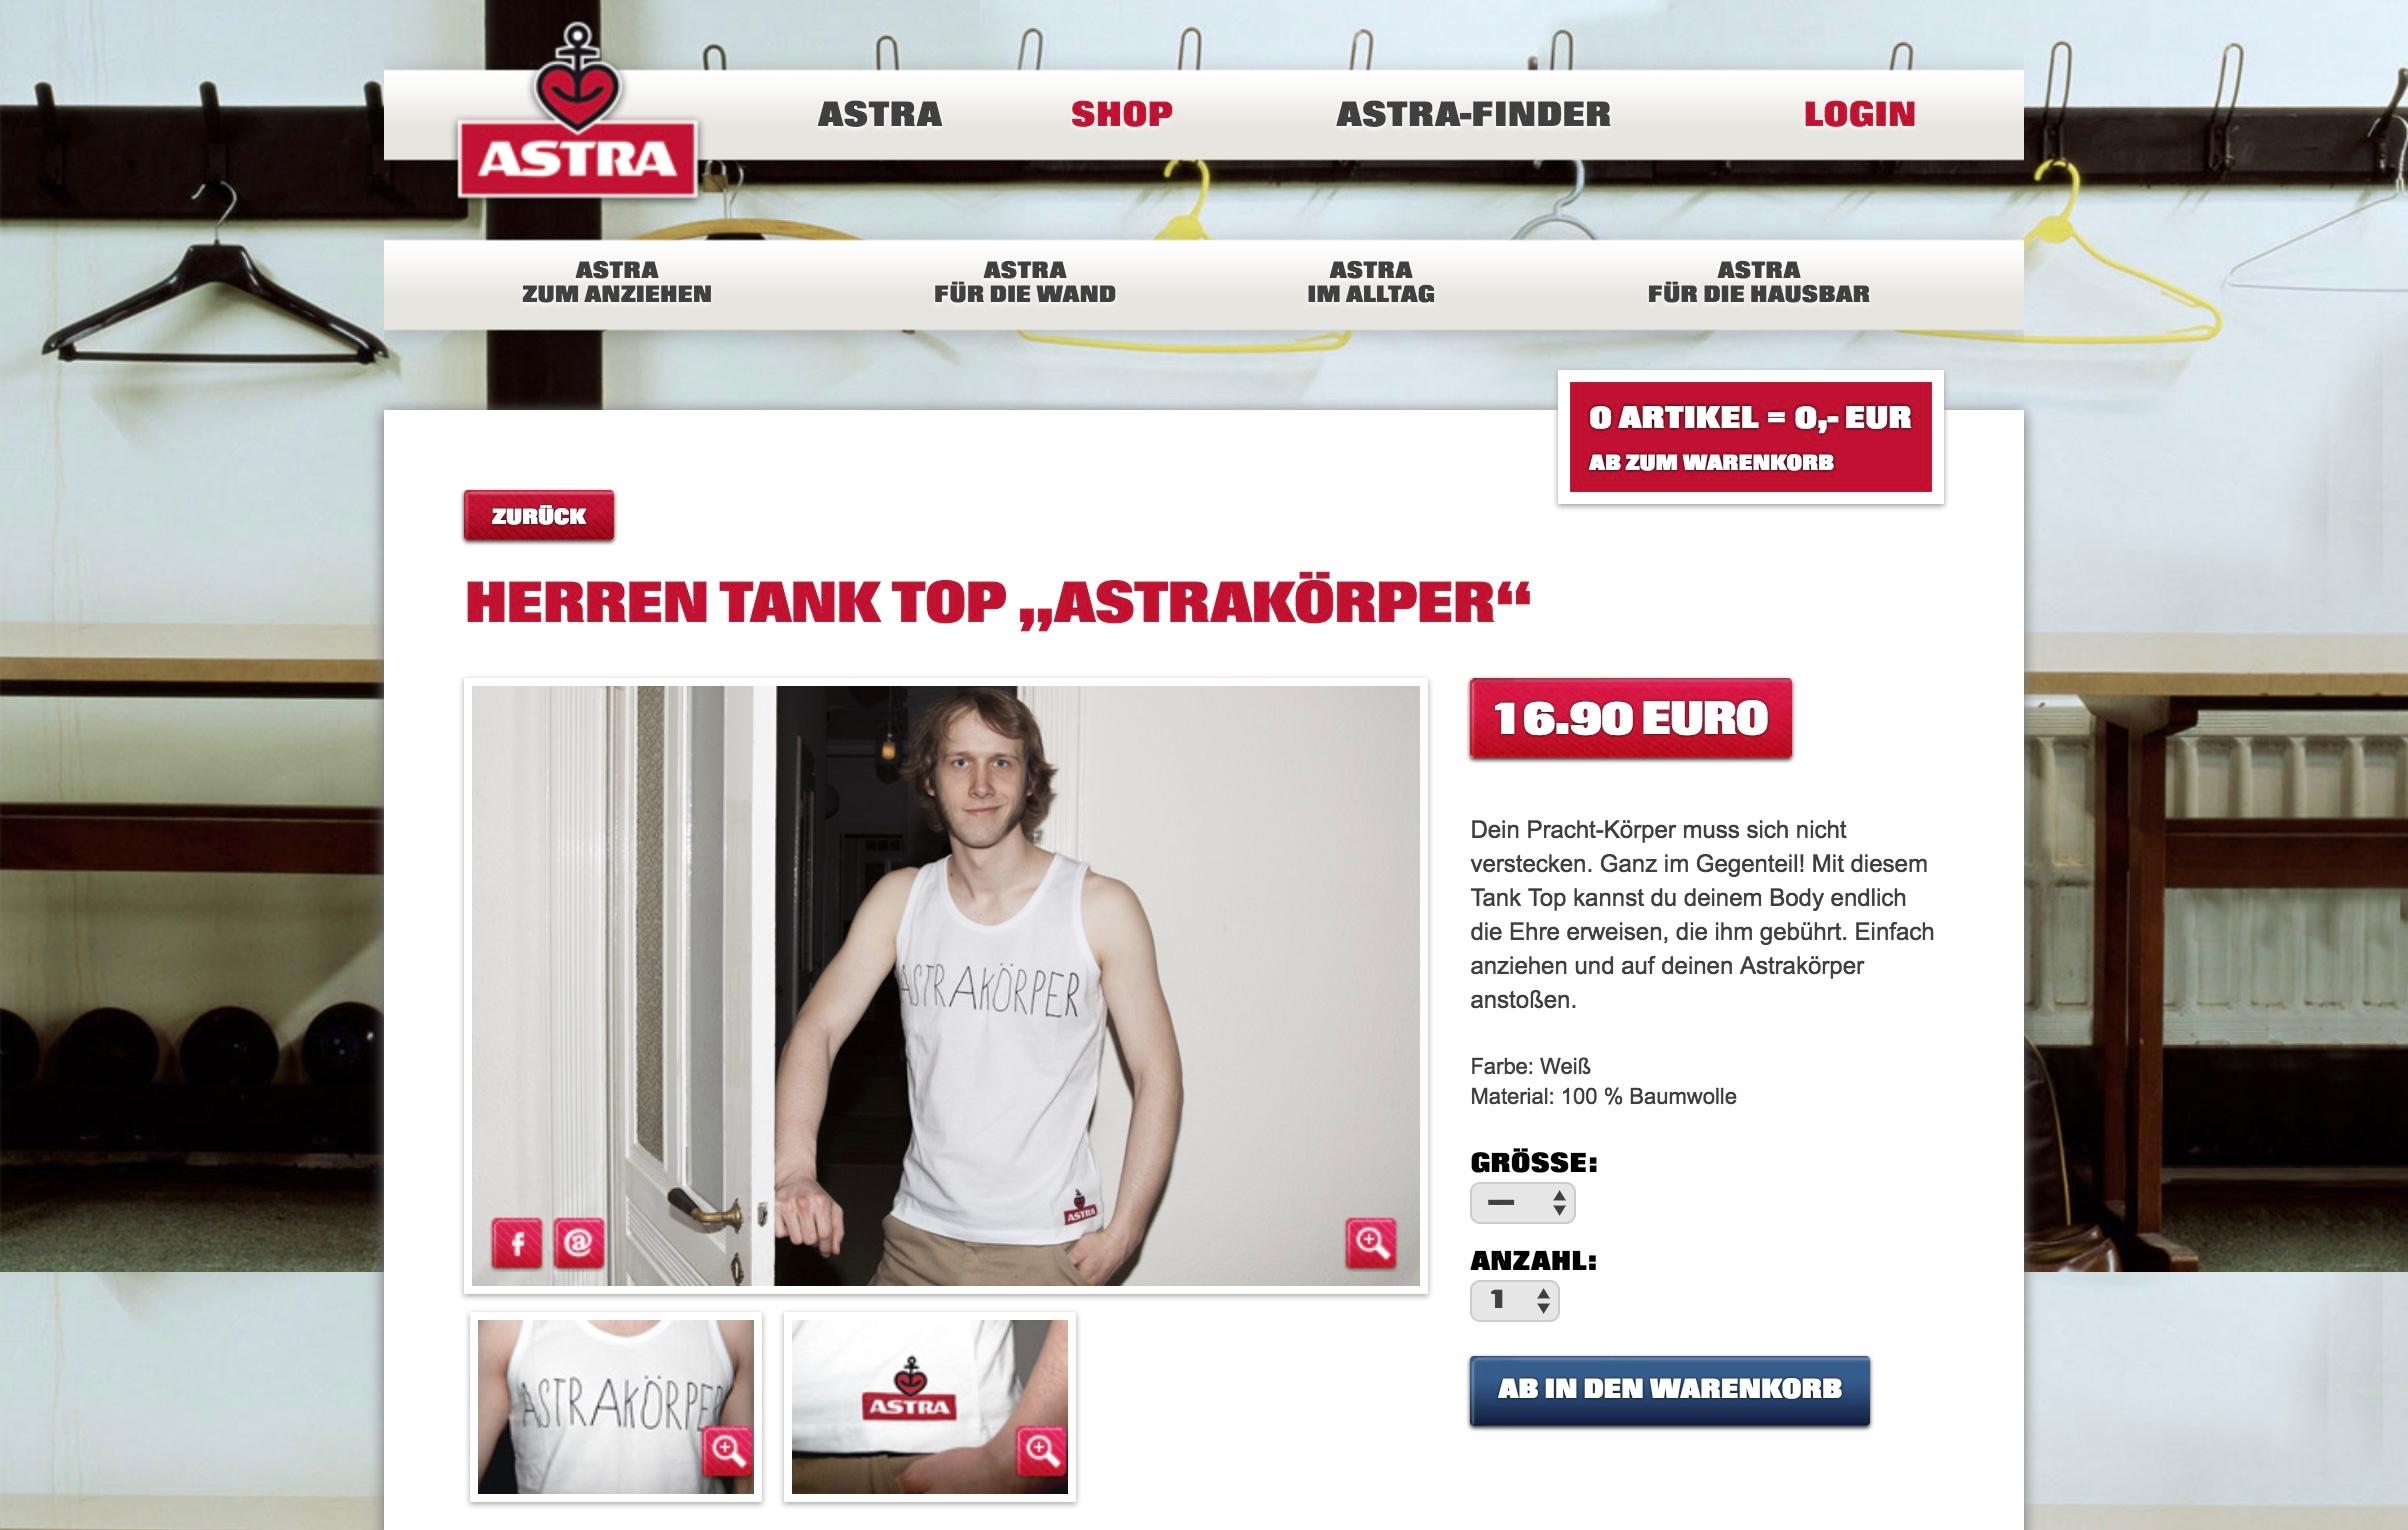 Astra Online Shop Tank Top Astrakörper